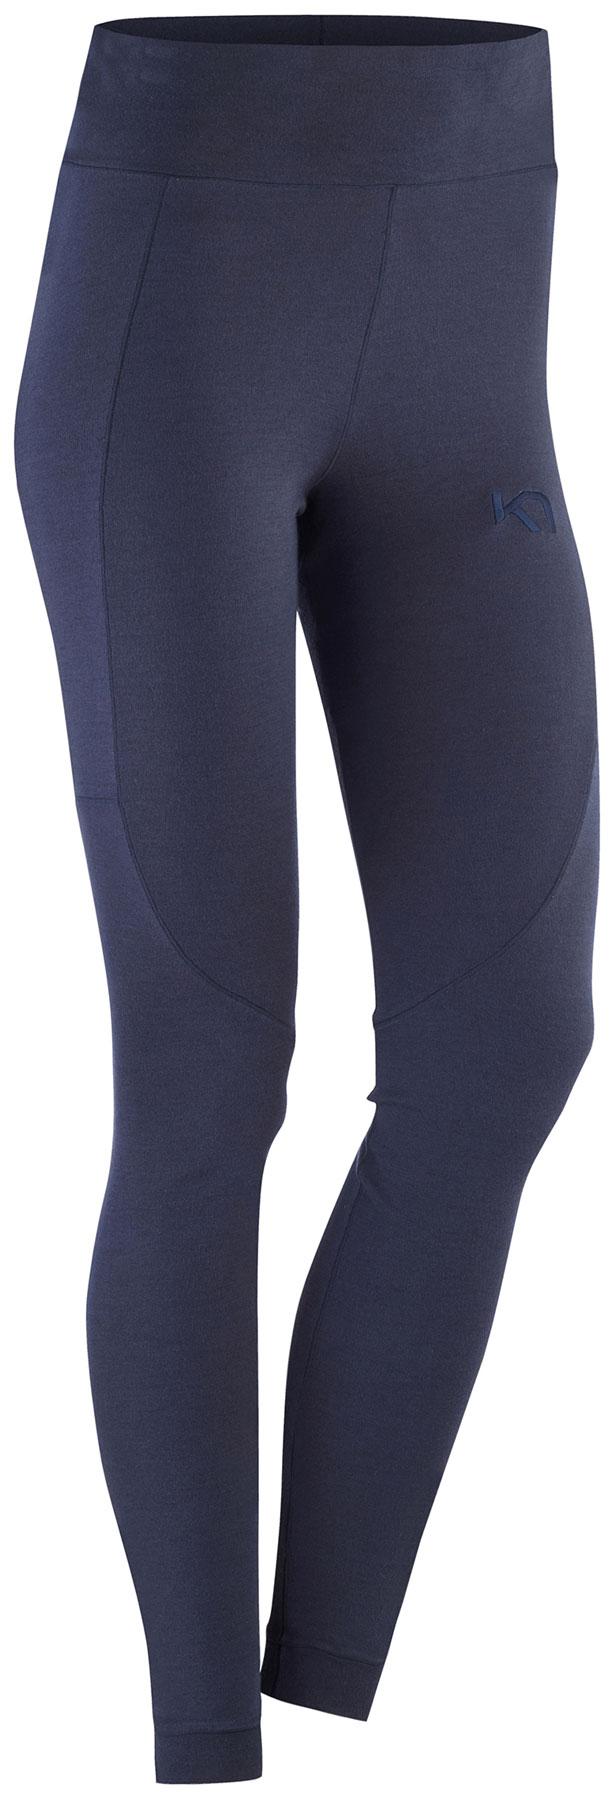 Image of Kari Traa Rulle High Waist Pant Women's Underpants - marin